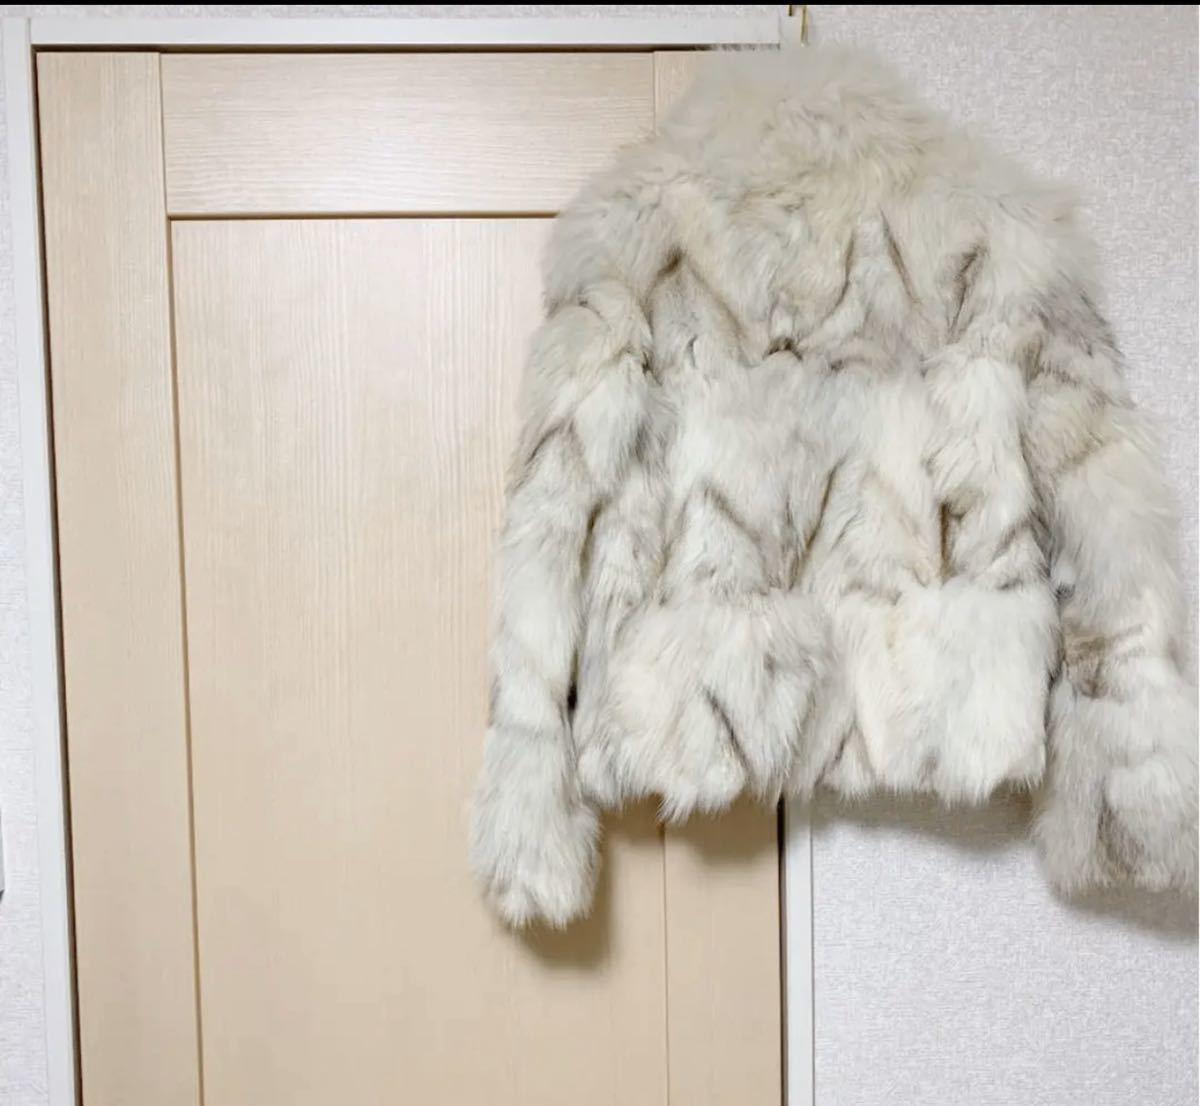 ESPRITMUR エスプリミュール ブルーフォックスファーコート ジャケット 毛皮 毛皮コート フォックスファー ファーコート ハーフコート